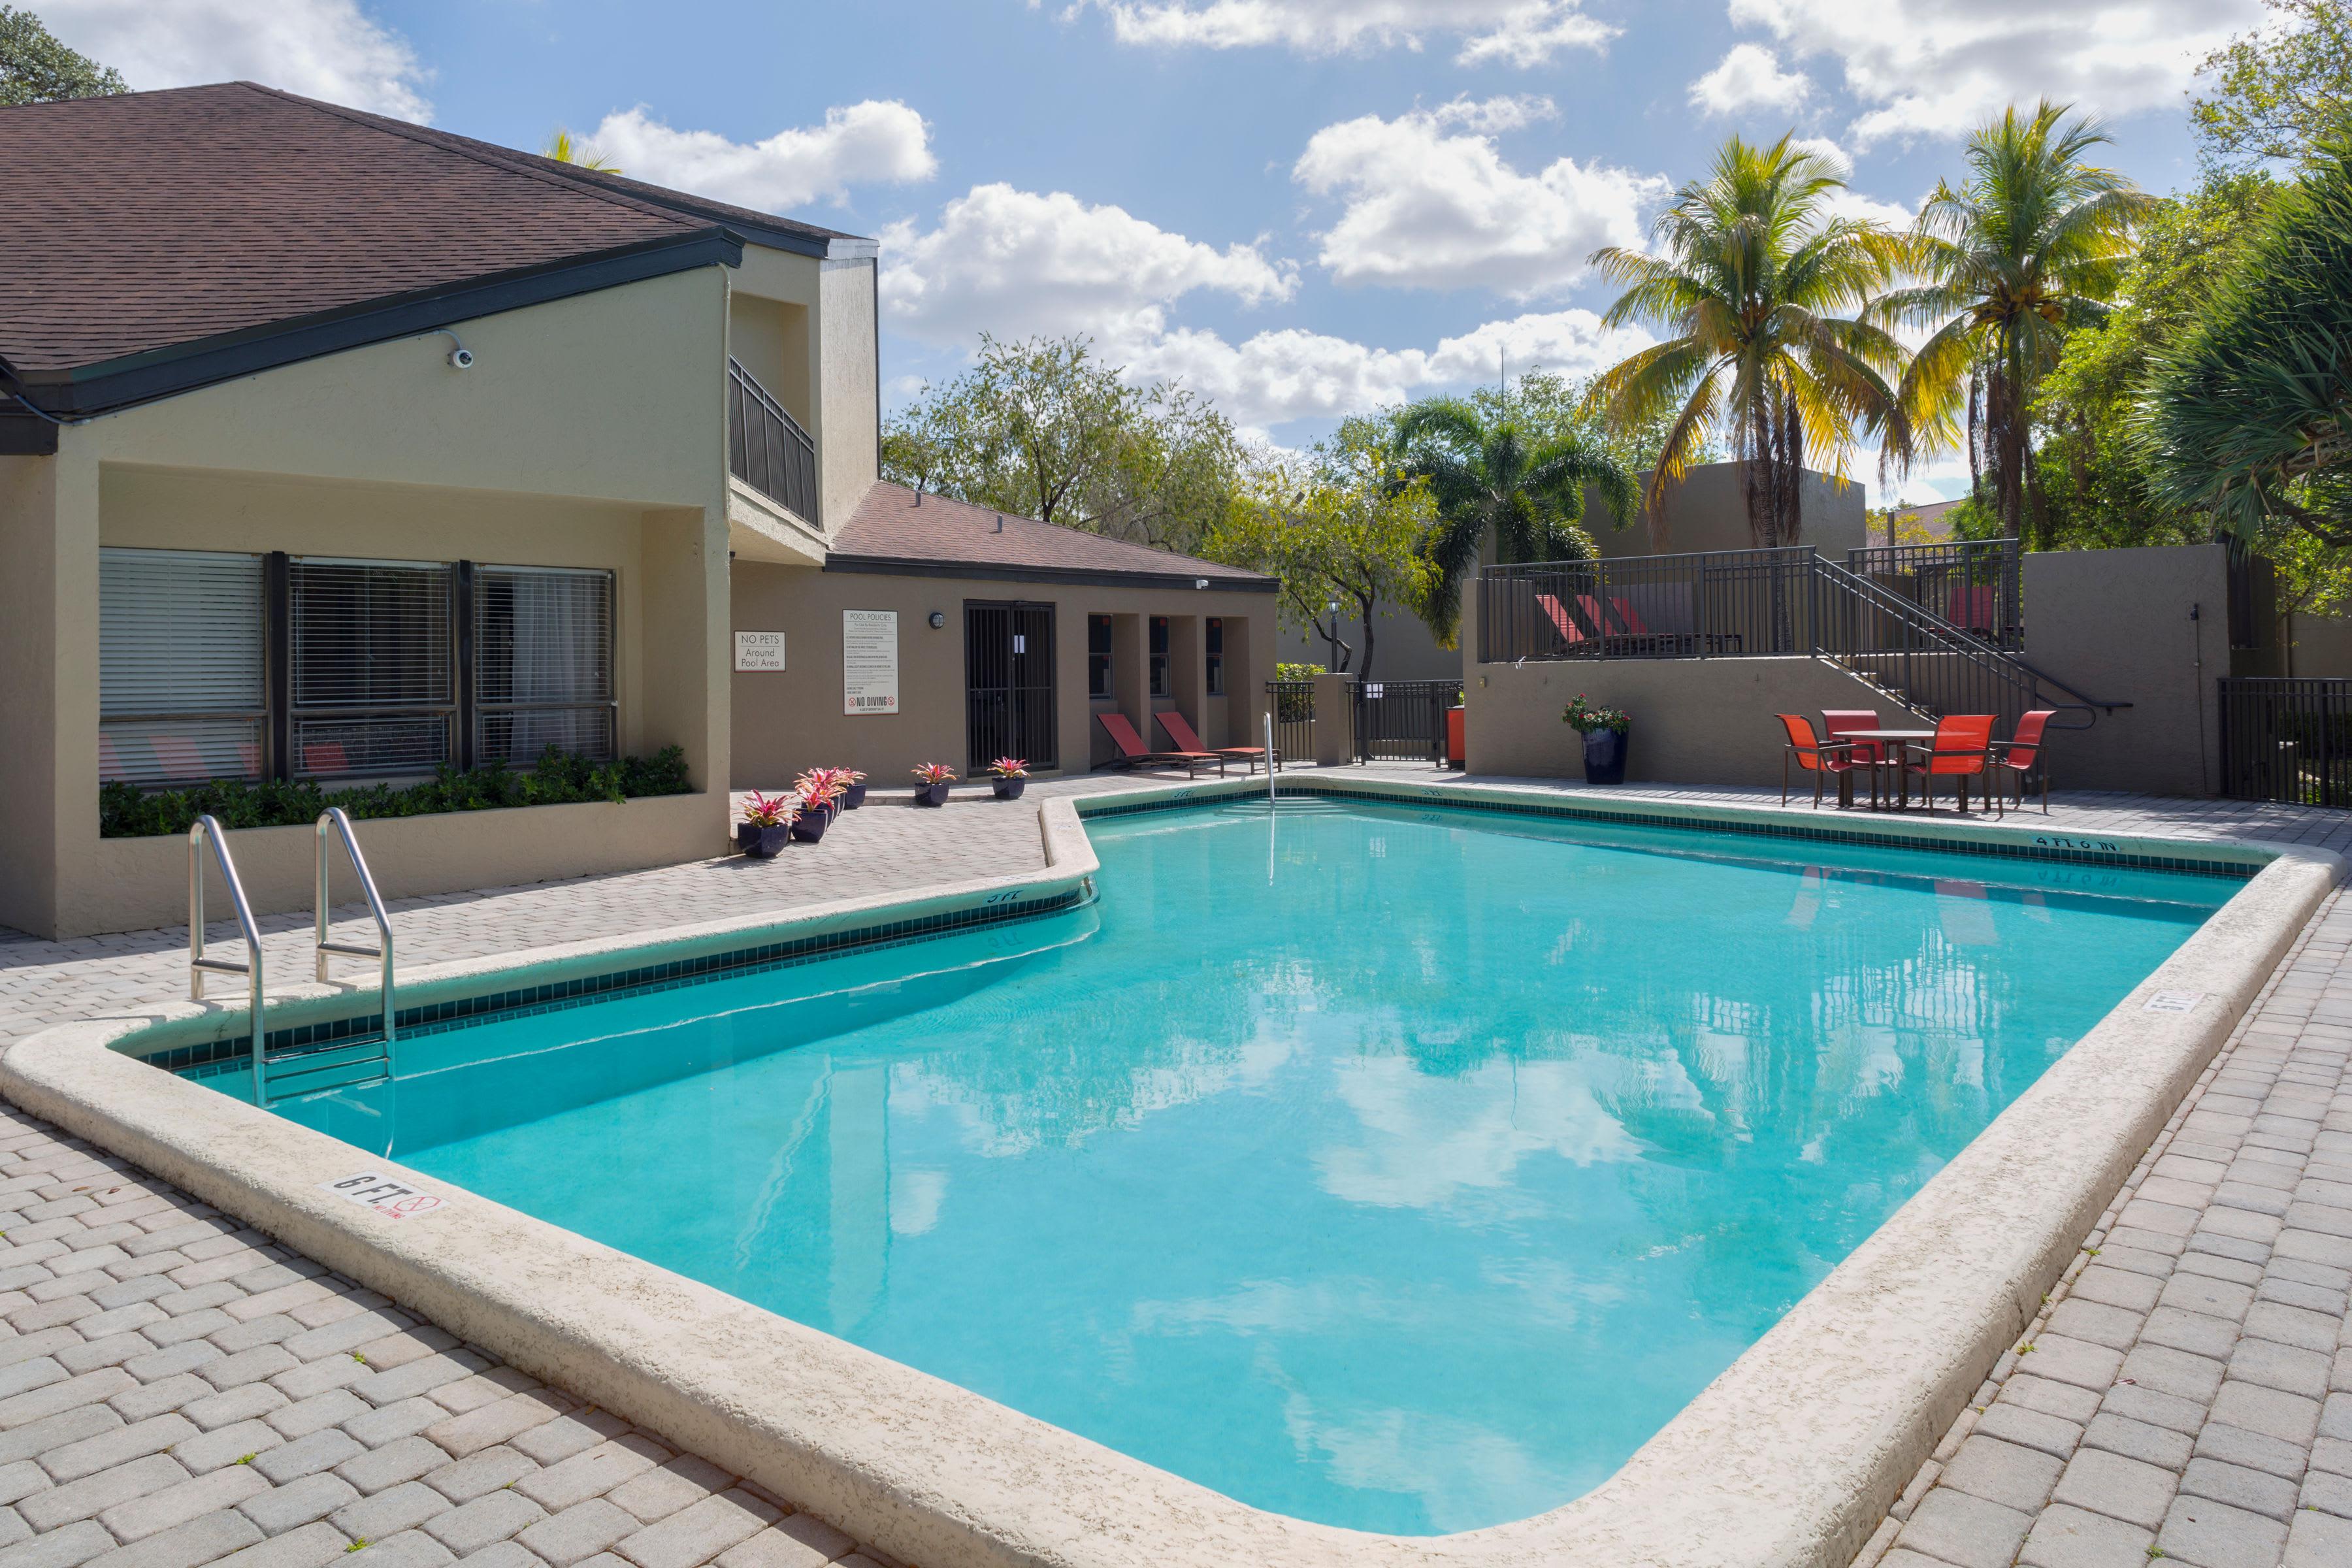 Barbecue area at Siena Apartments in Plantation, Florida